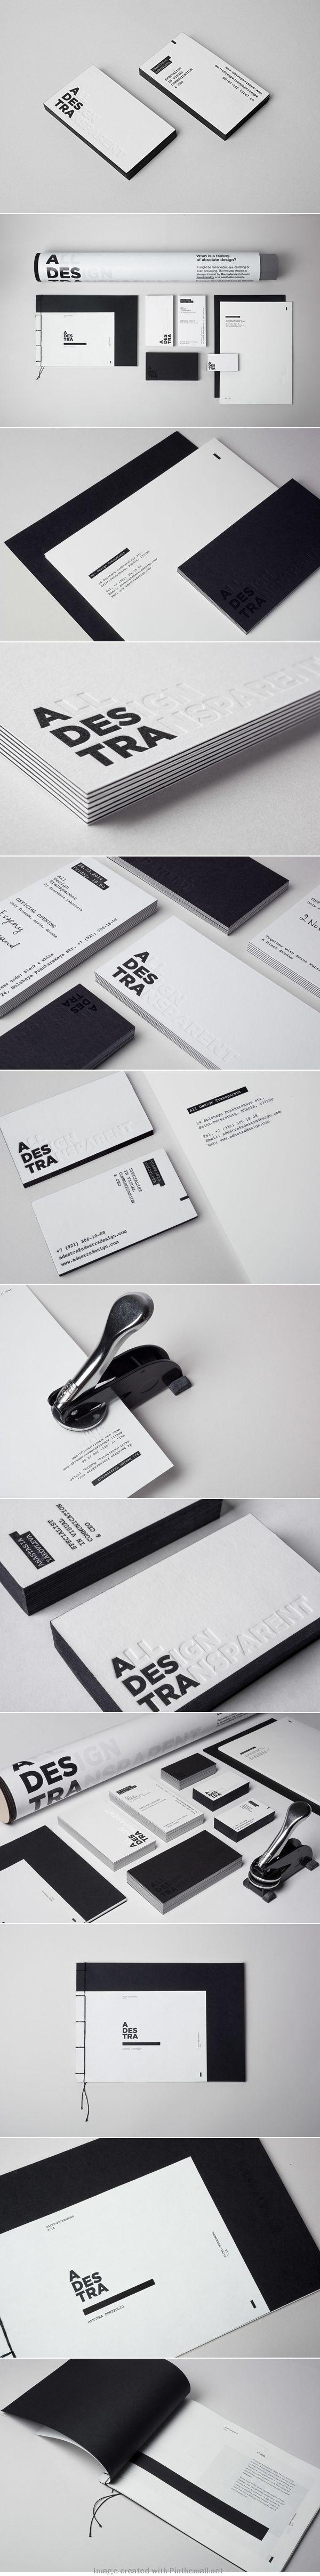 All Design Transparent. SELF-BRANDING.